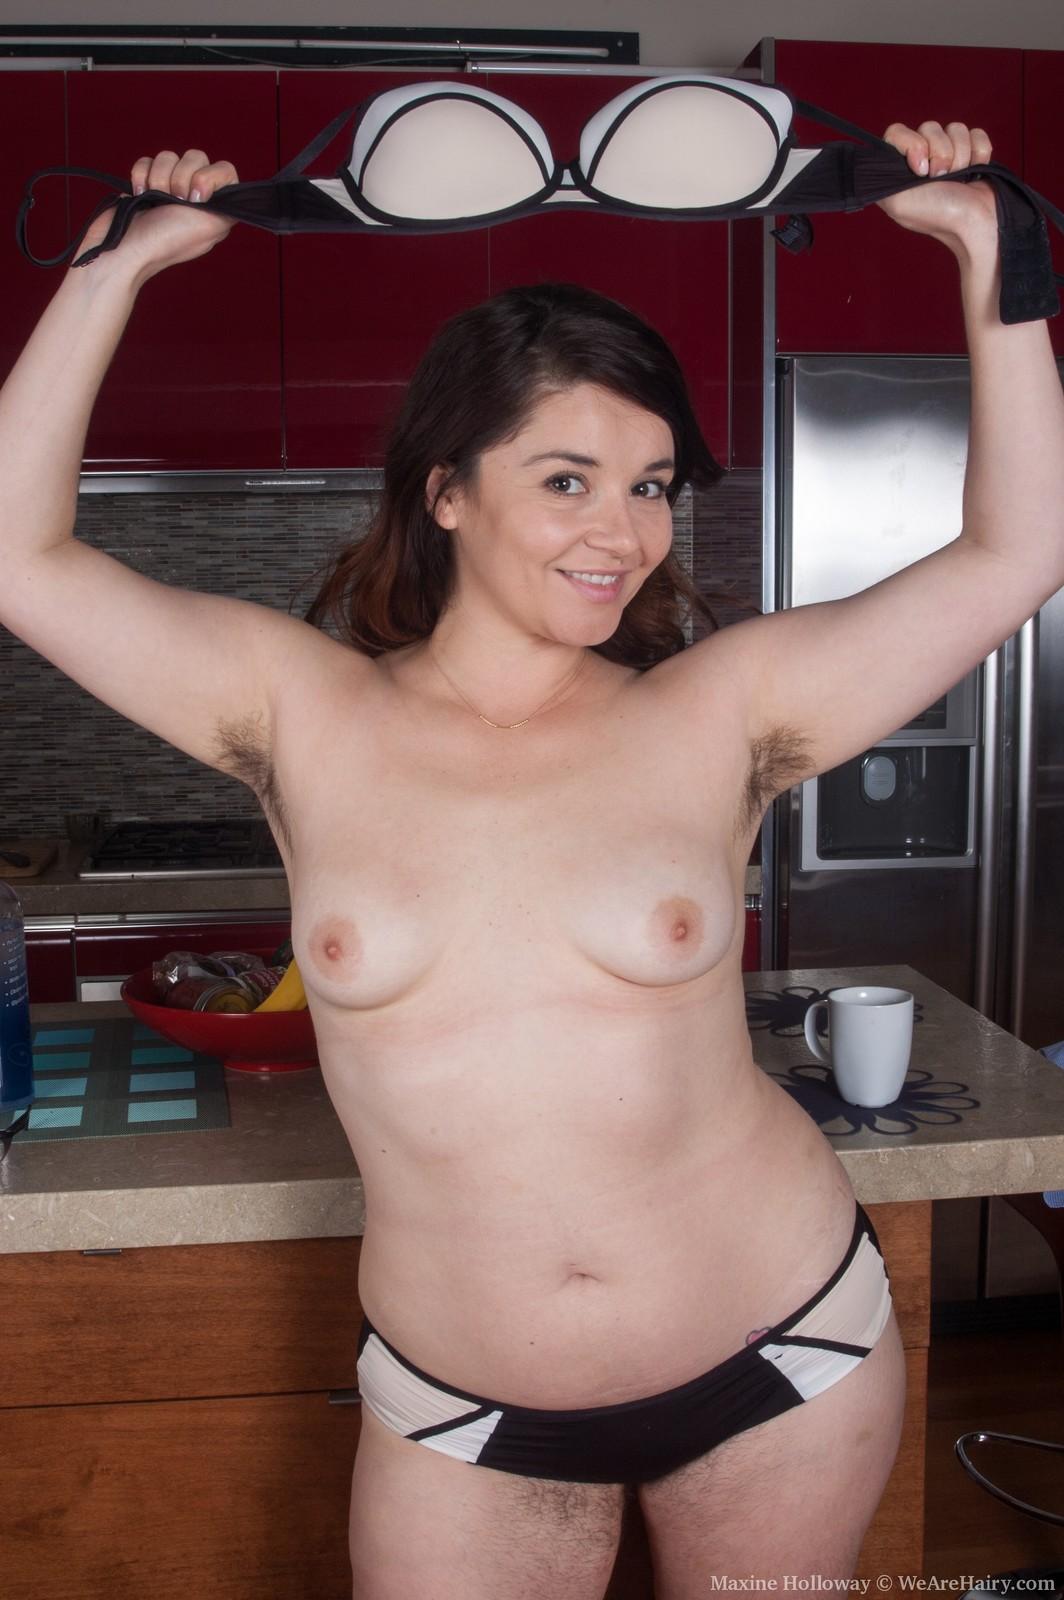 Naked woman boobs